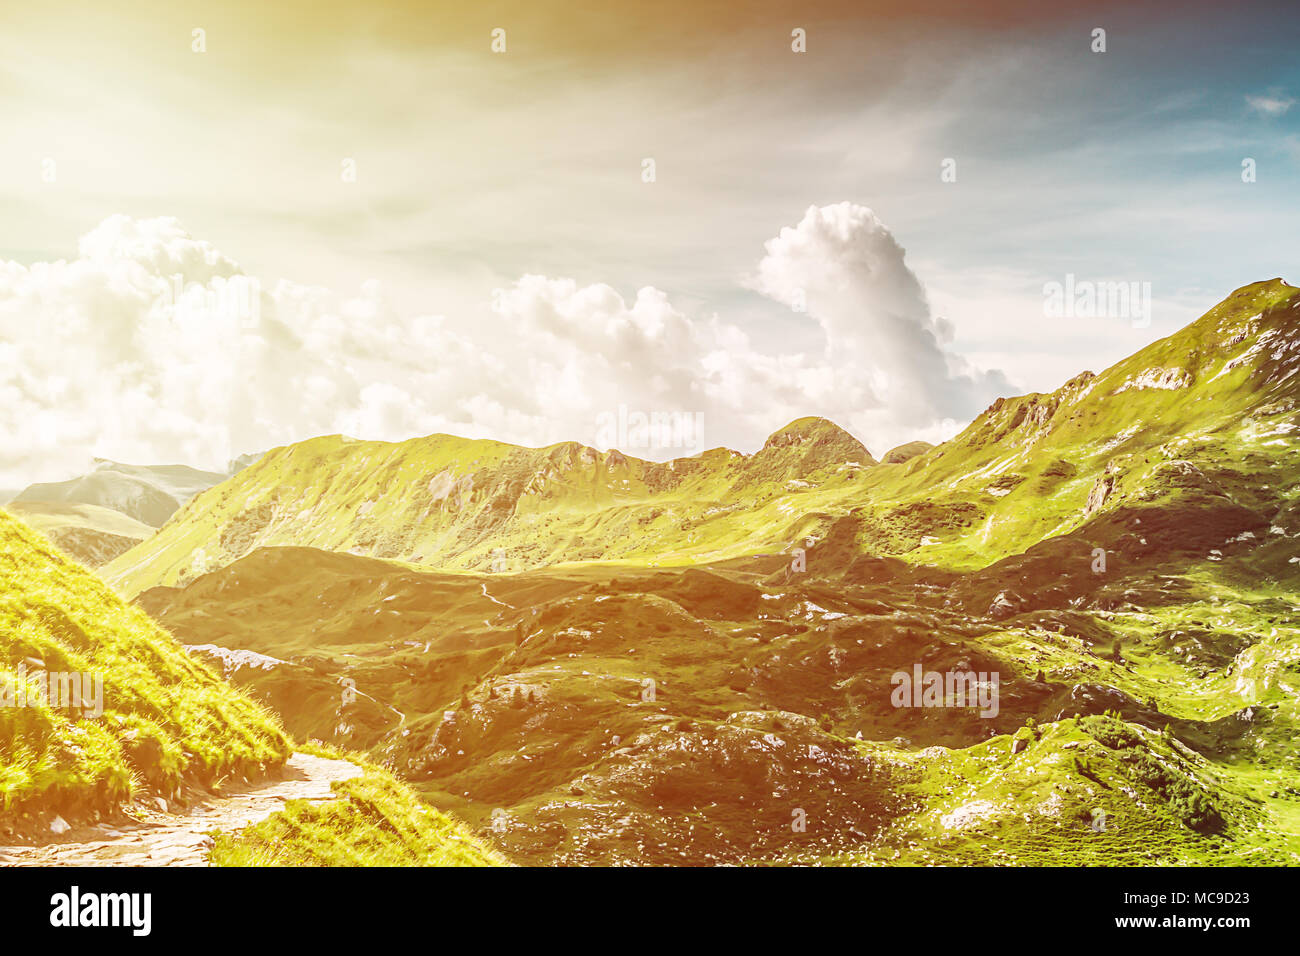 Summer sunny mountain landscape in Valsabbia, Brescia, Italy. - Stock Image